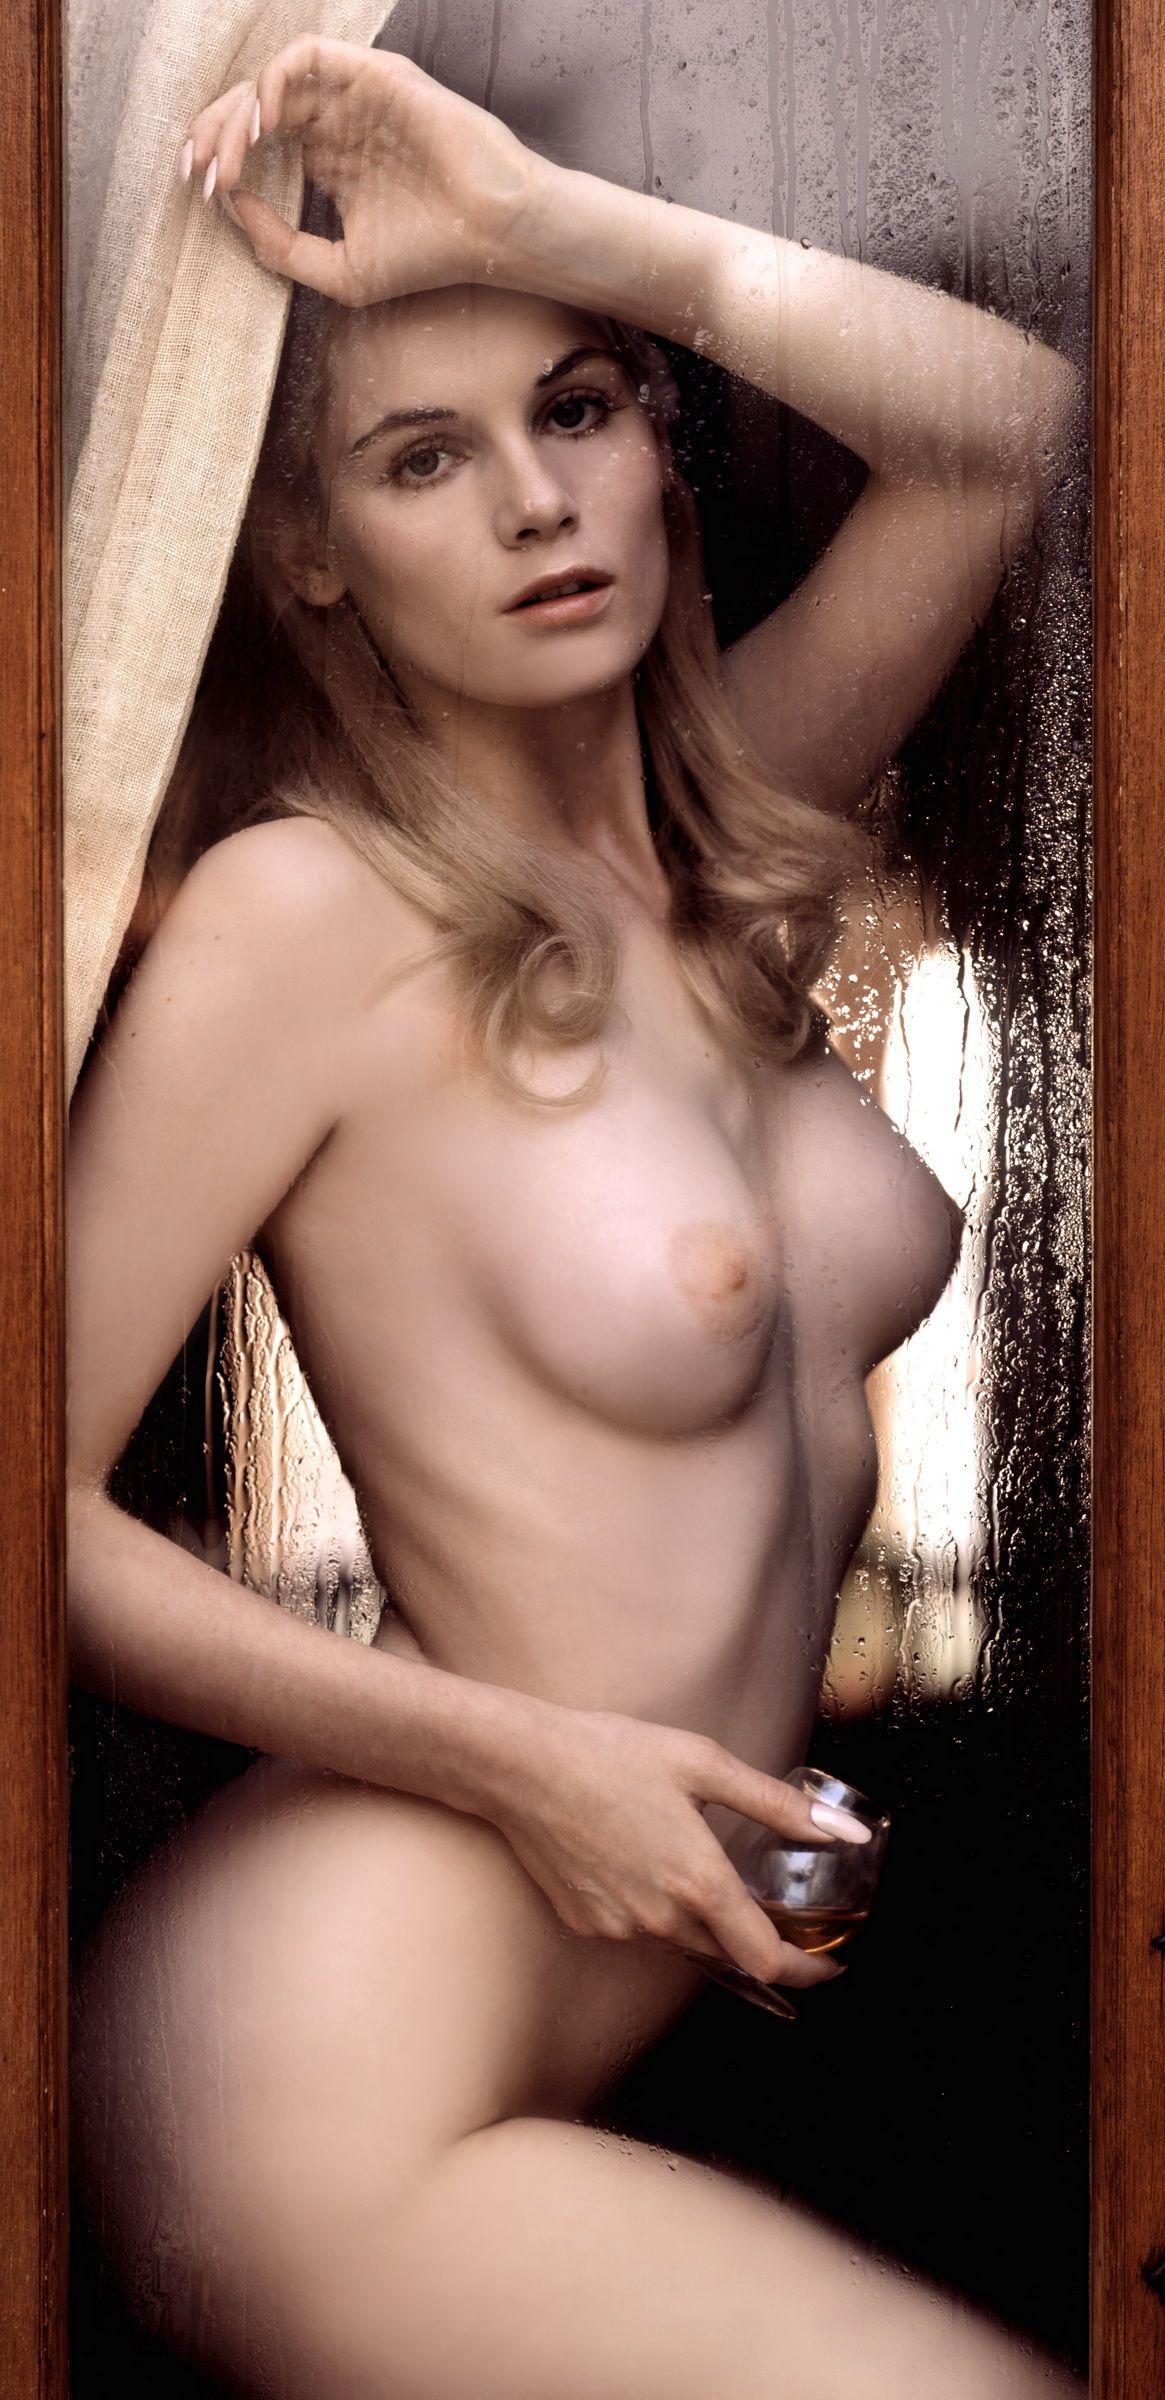 Modell April J nackt